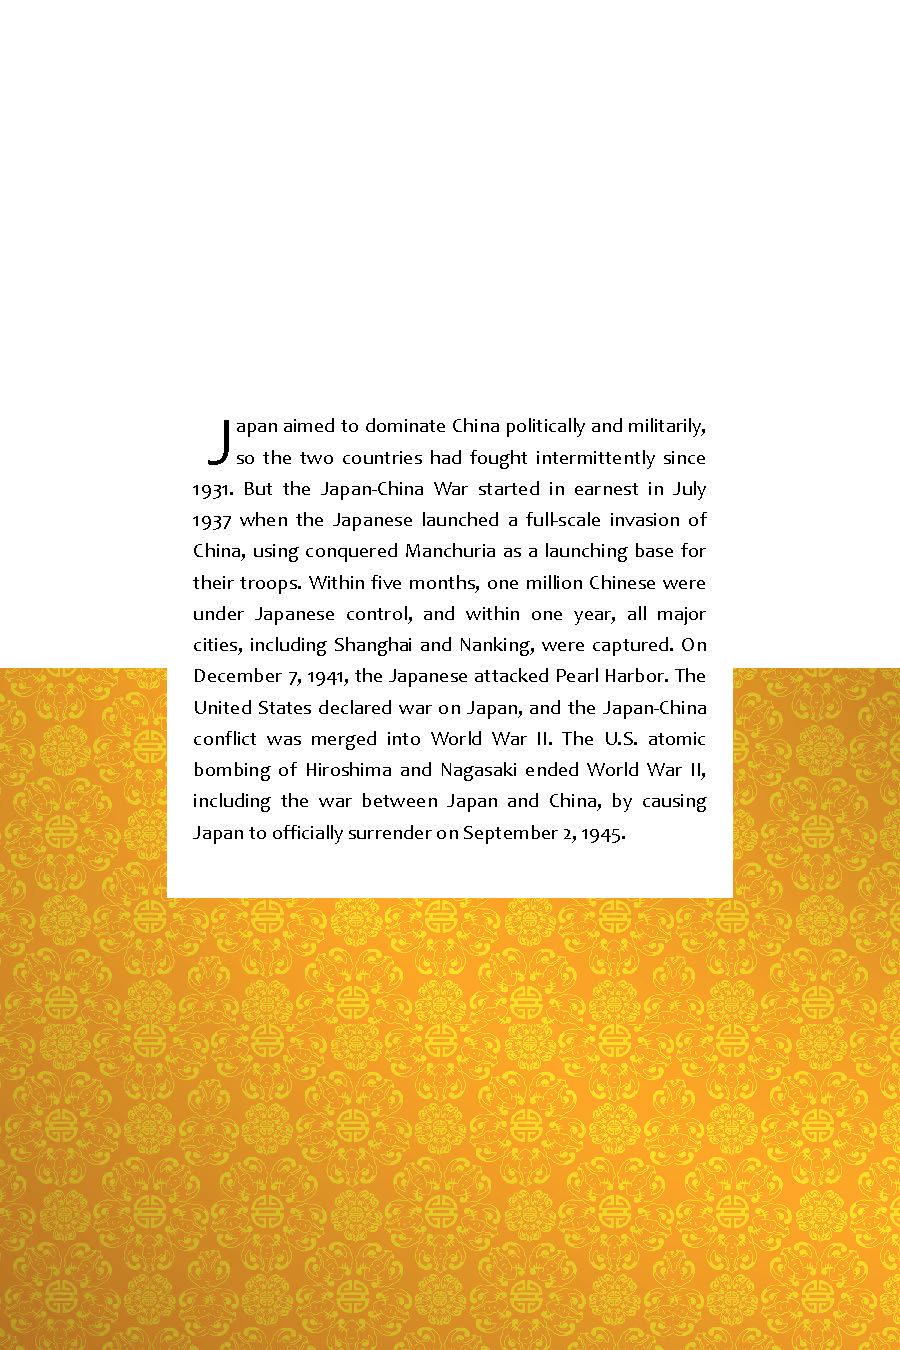 binder4_page_14.jpg